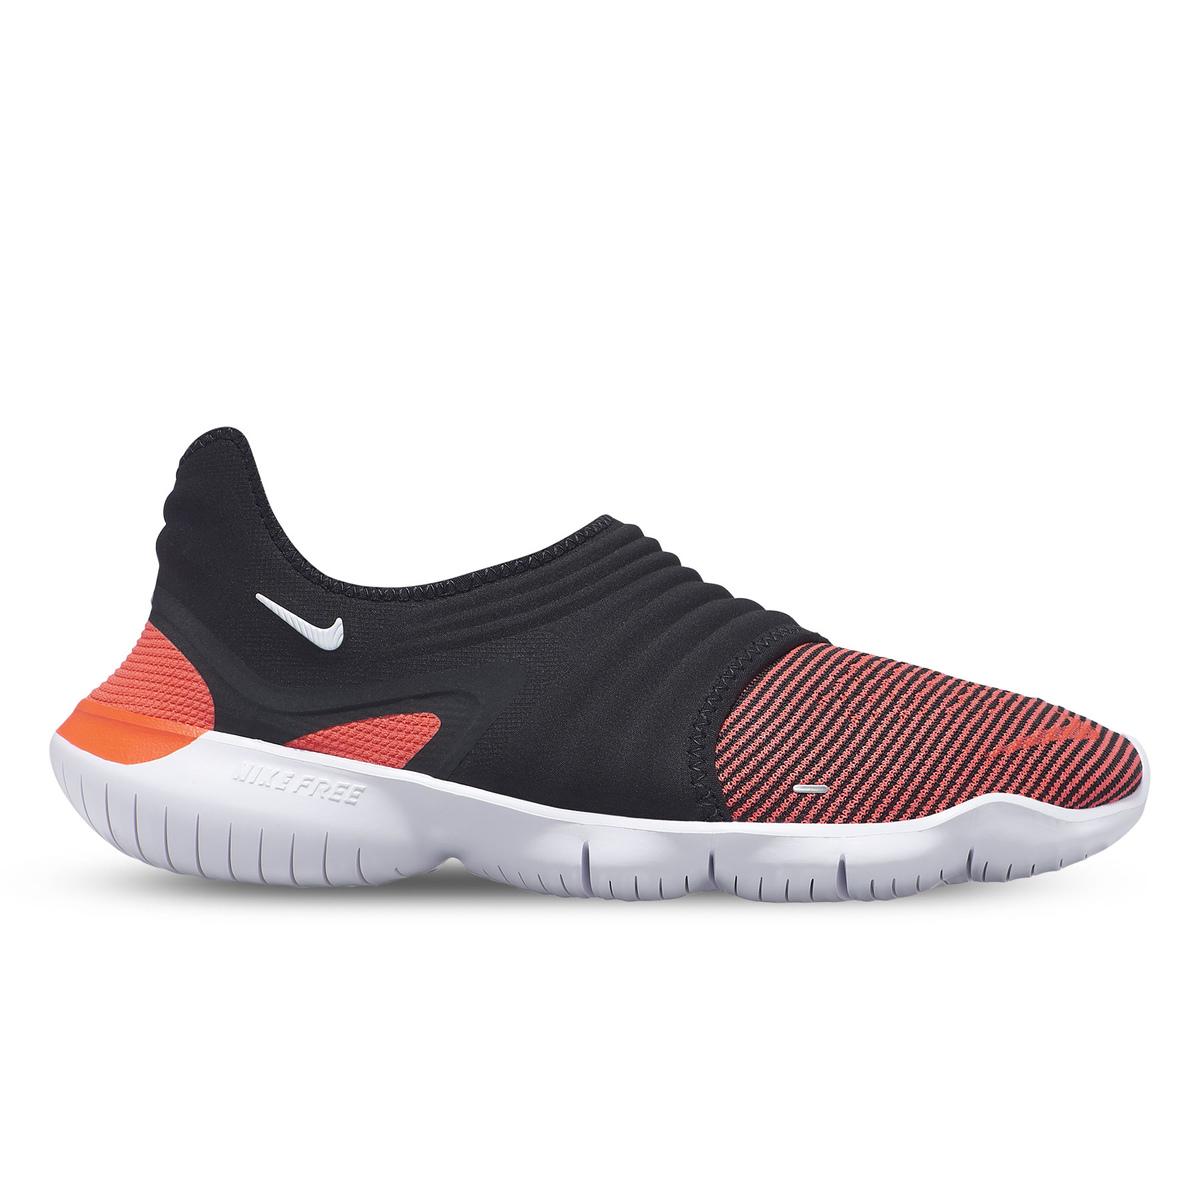 Economici Free Run 5.0 V3 Nike Donna Scarpe Saldi